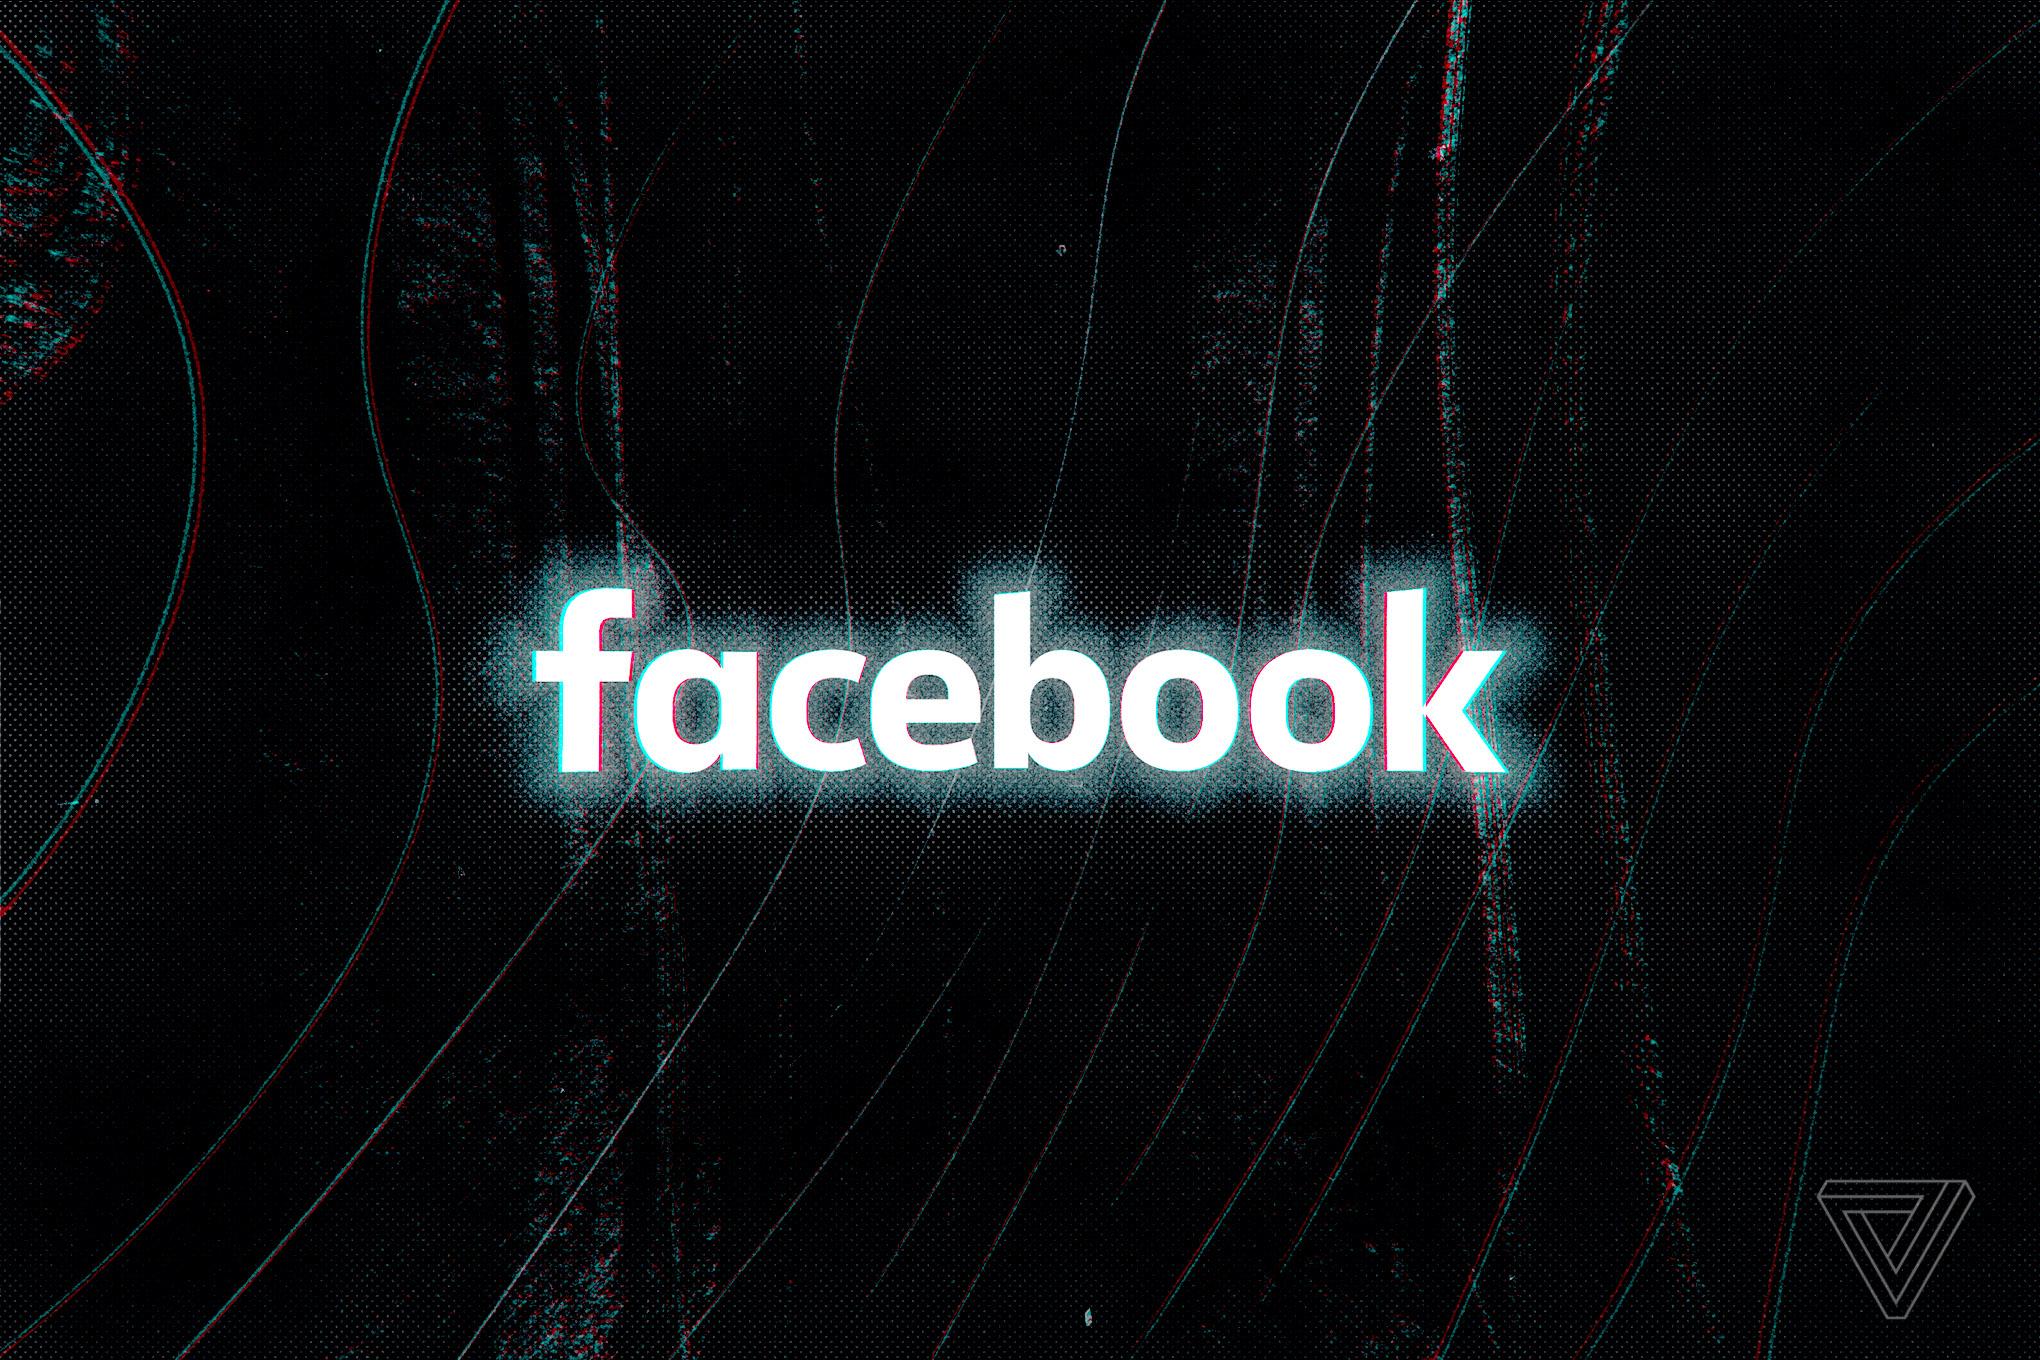 Facebook - The Verge